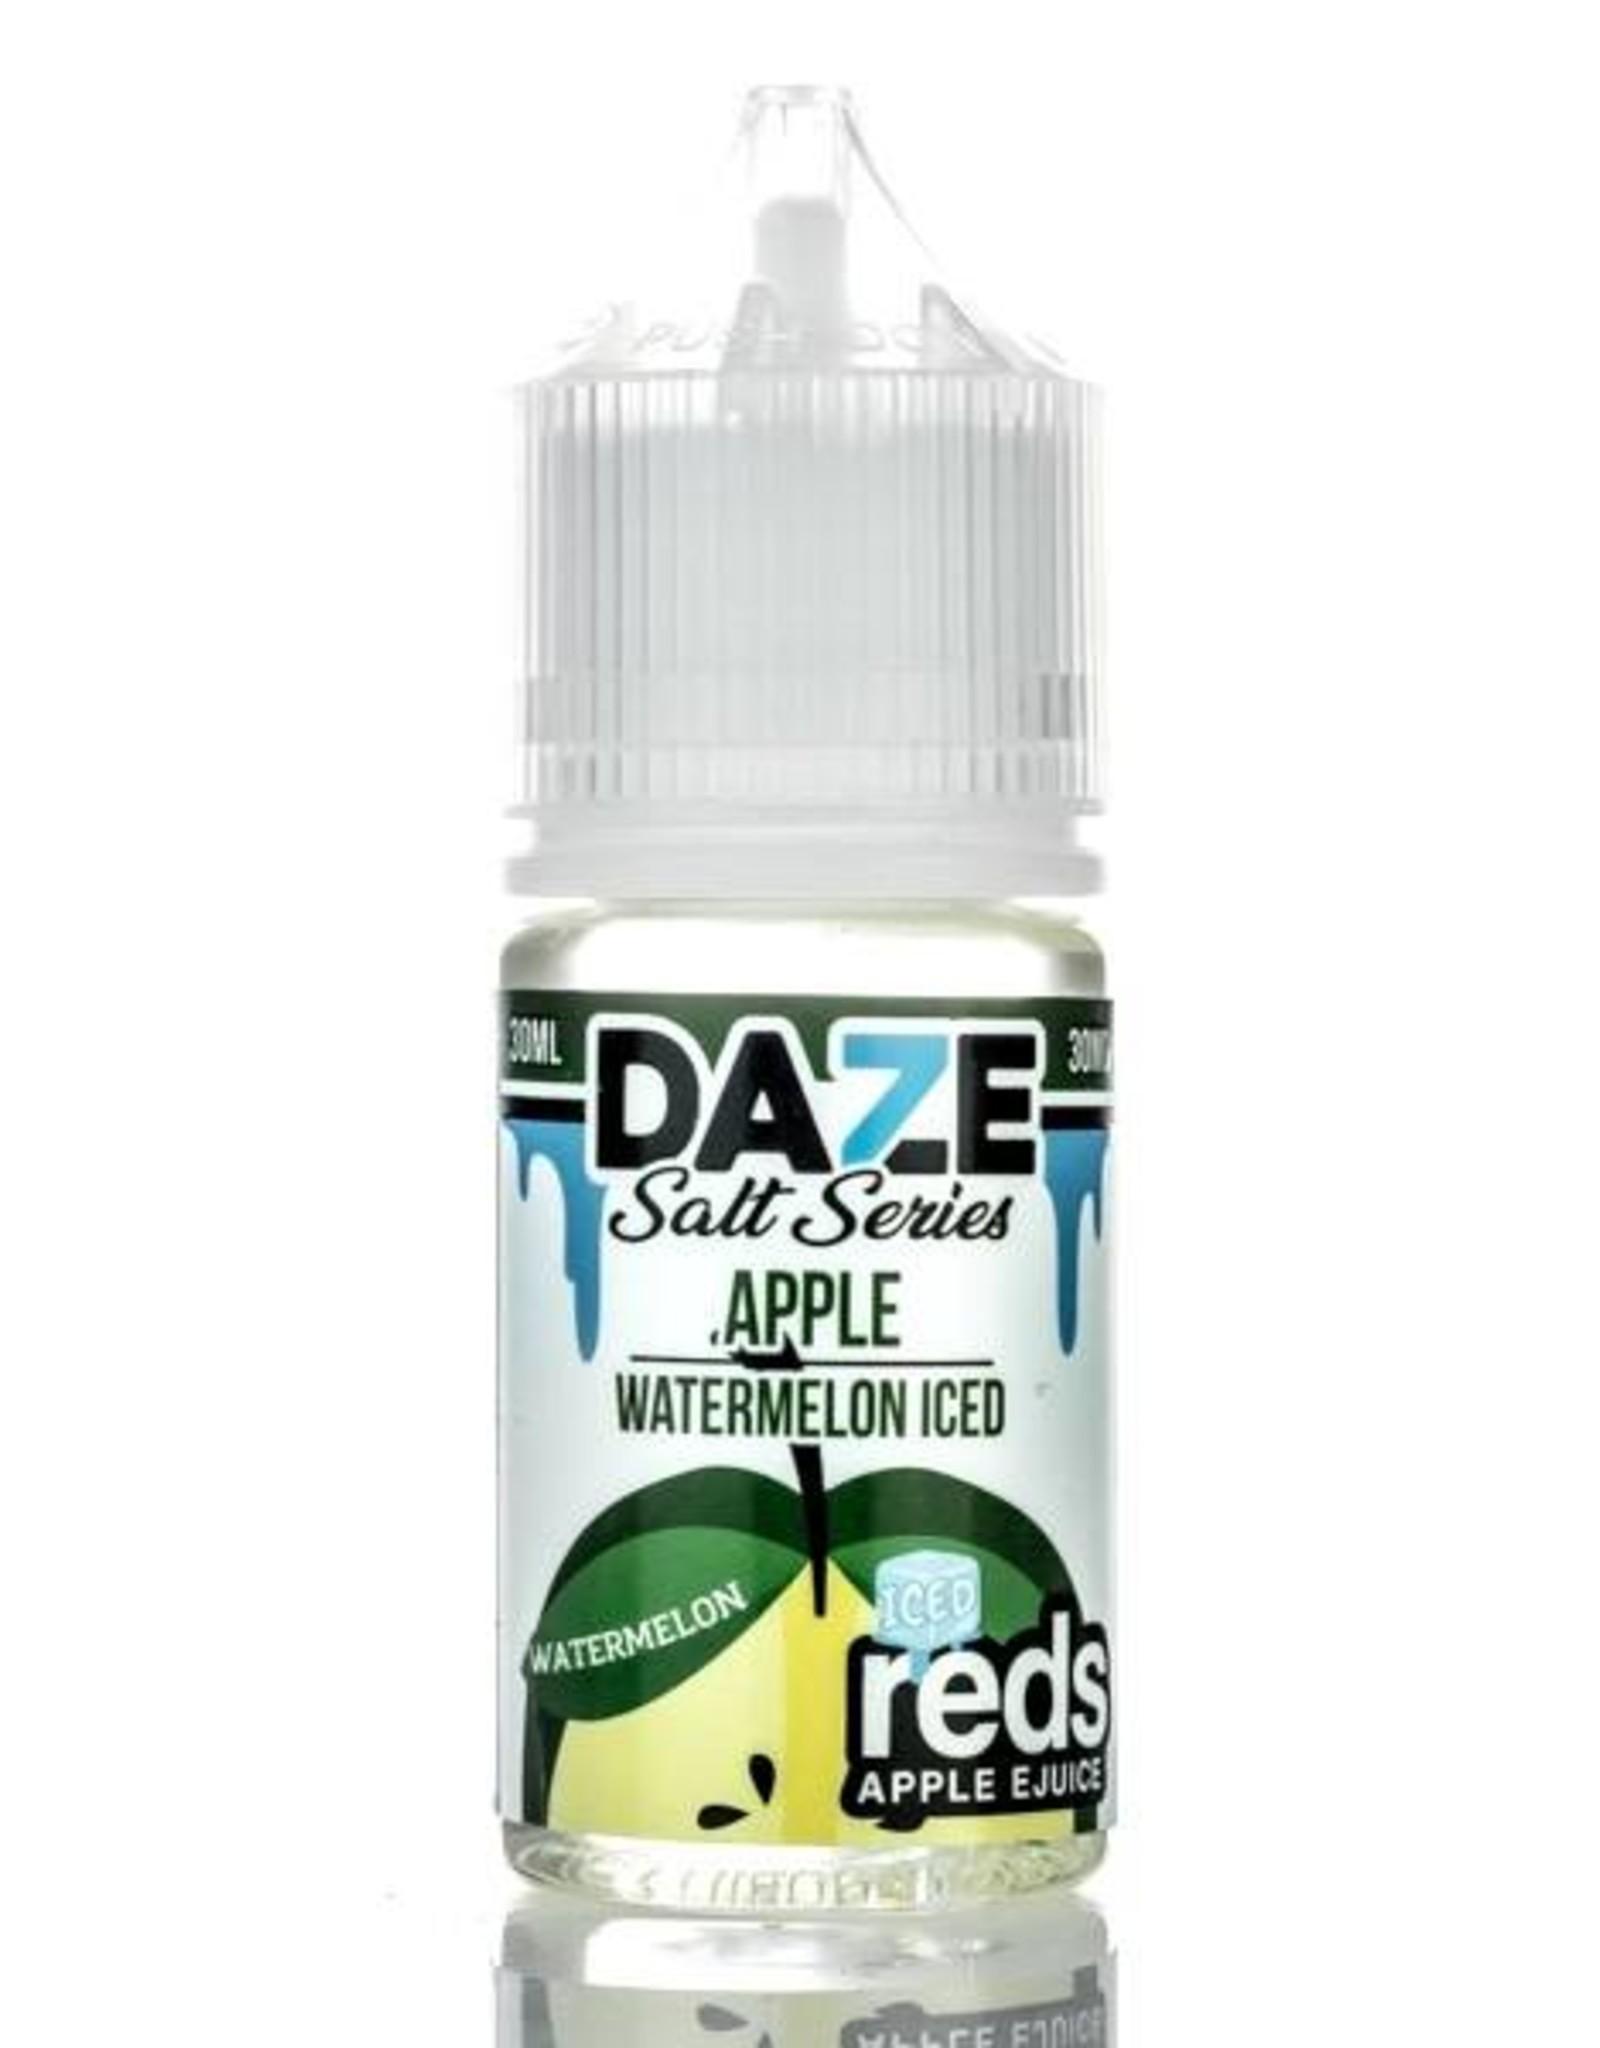 7 Daze 7 Daze - Salt Series Apple *Watermelon* Iced (30mL)